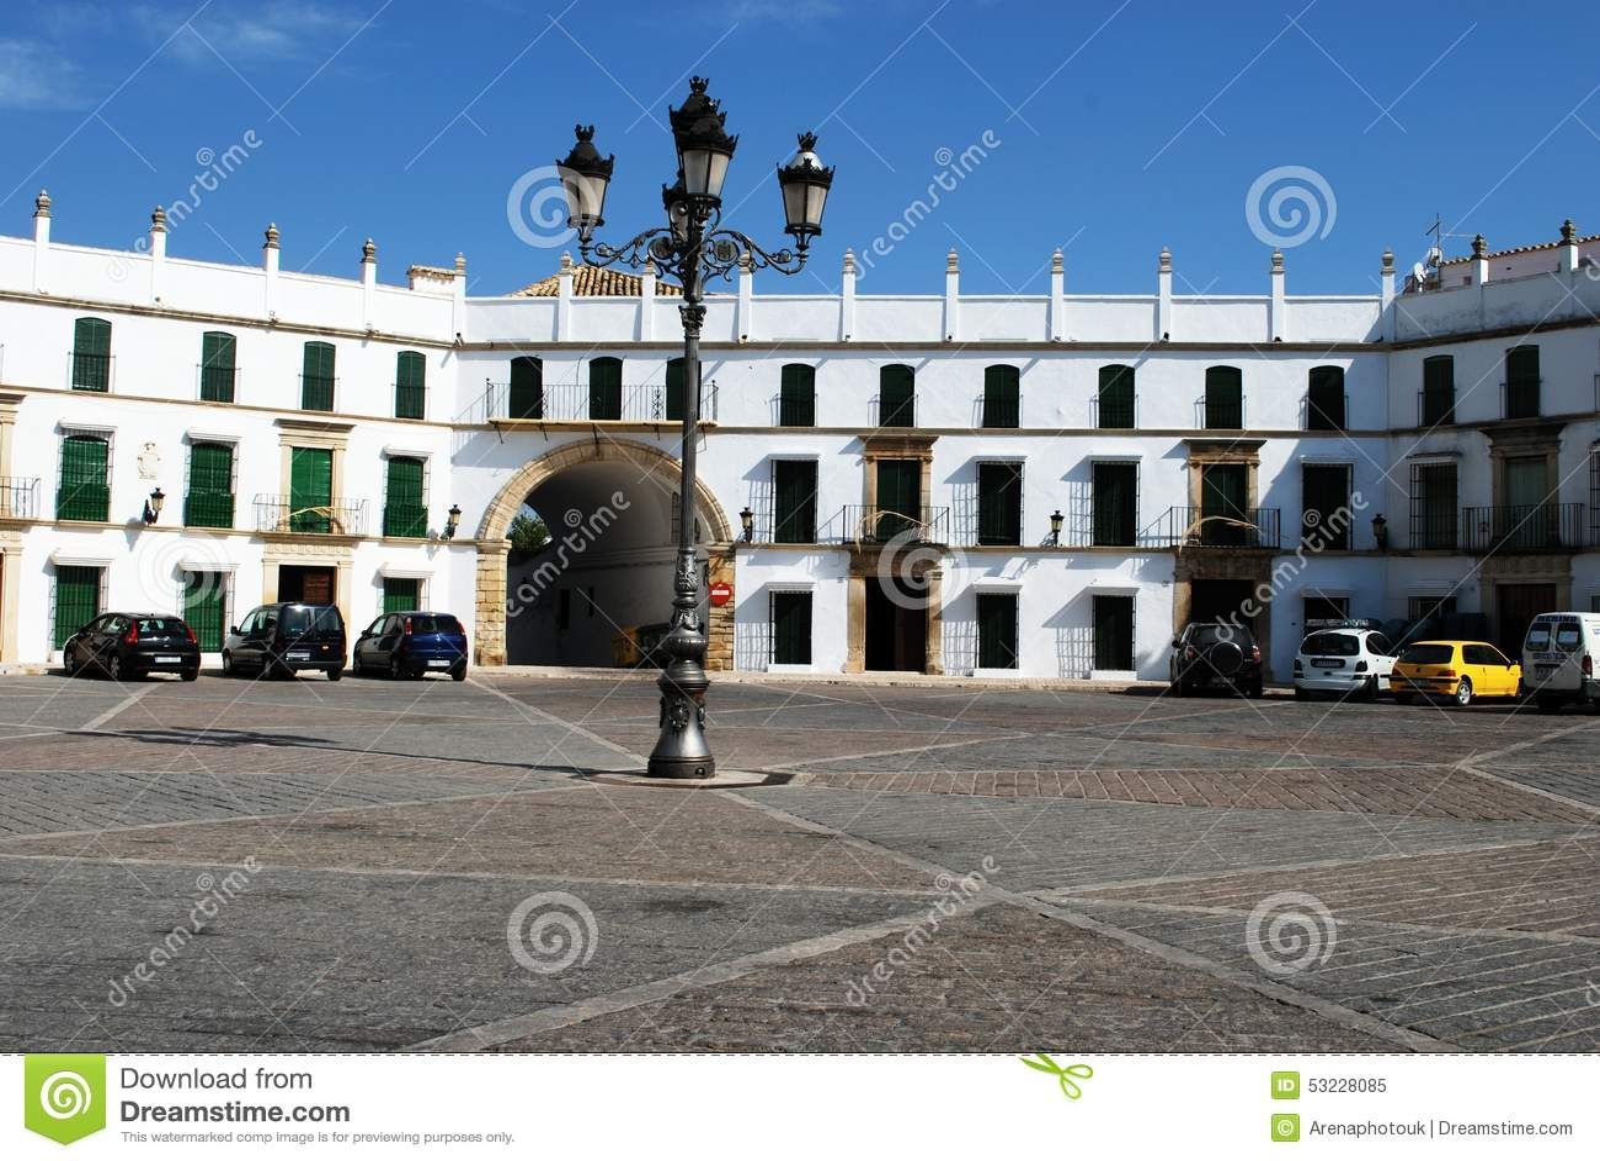 Plaza, la Frontera de Aguilar de